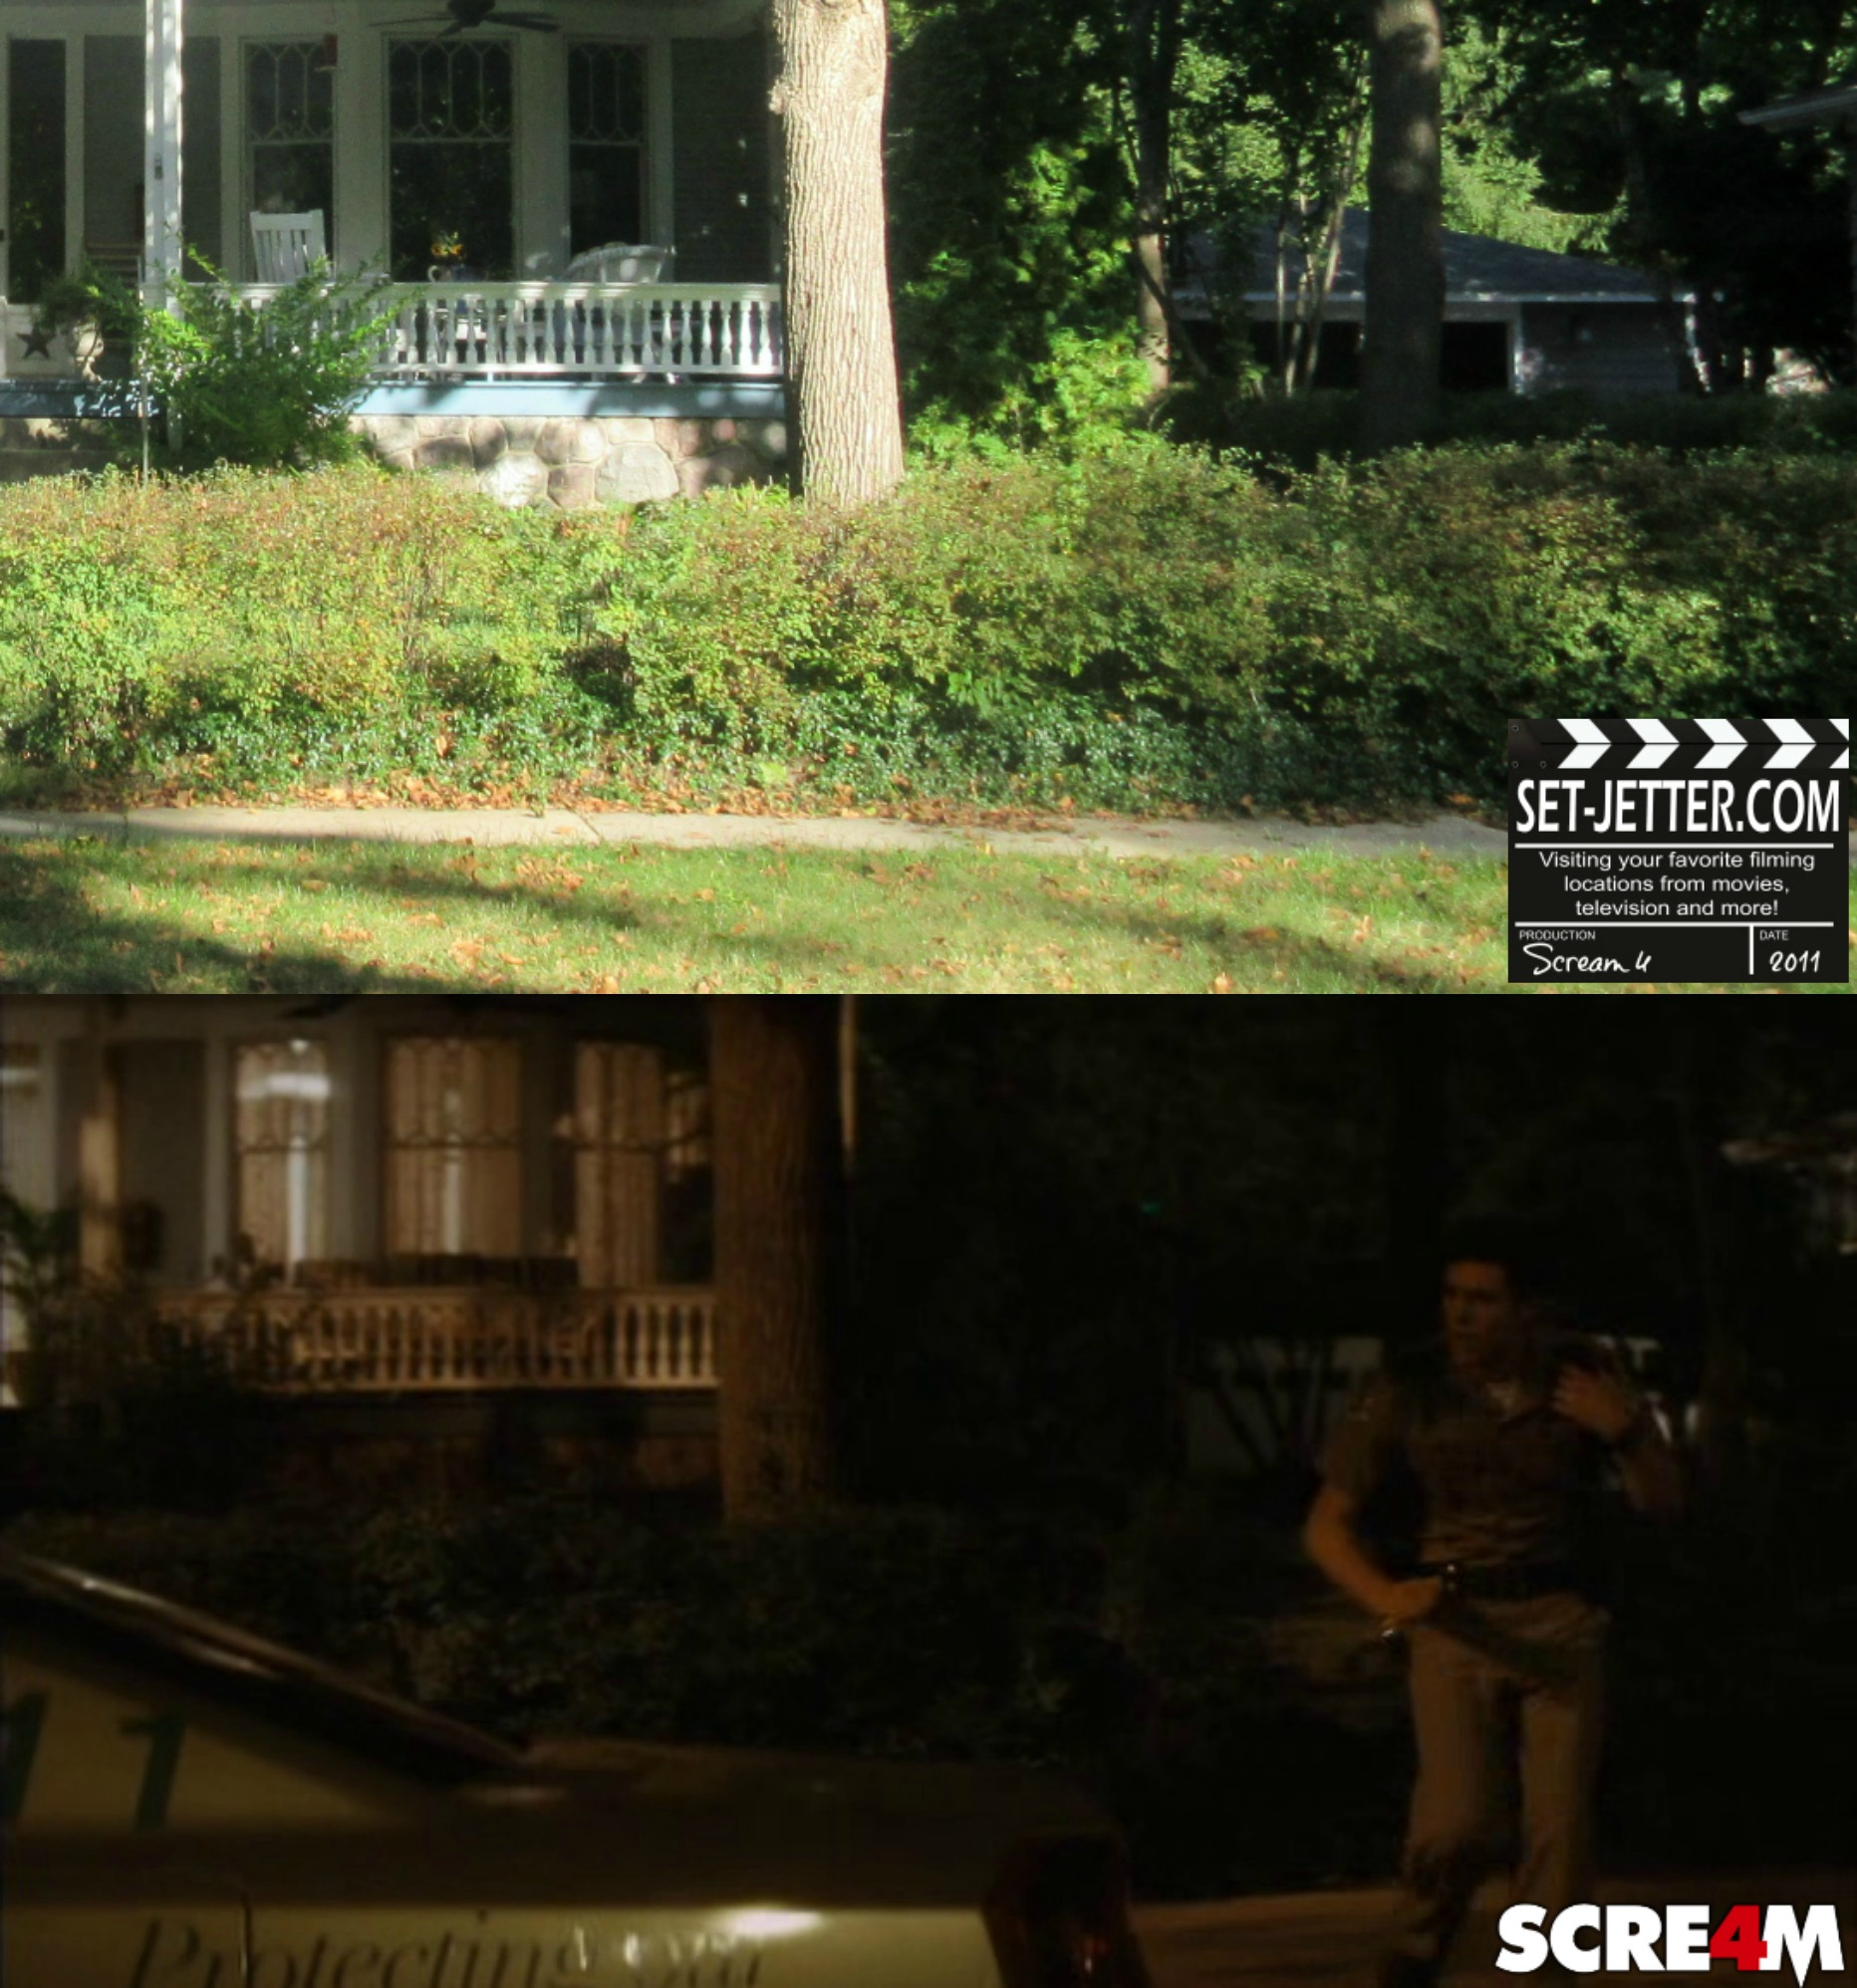 Scream4 comparison 137.jpg